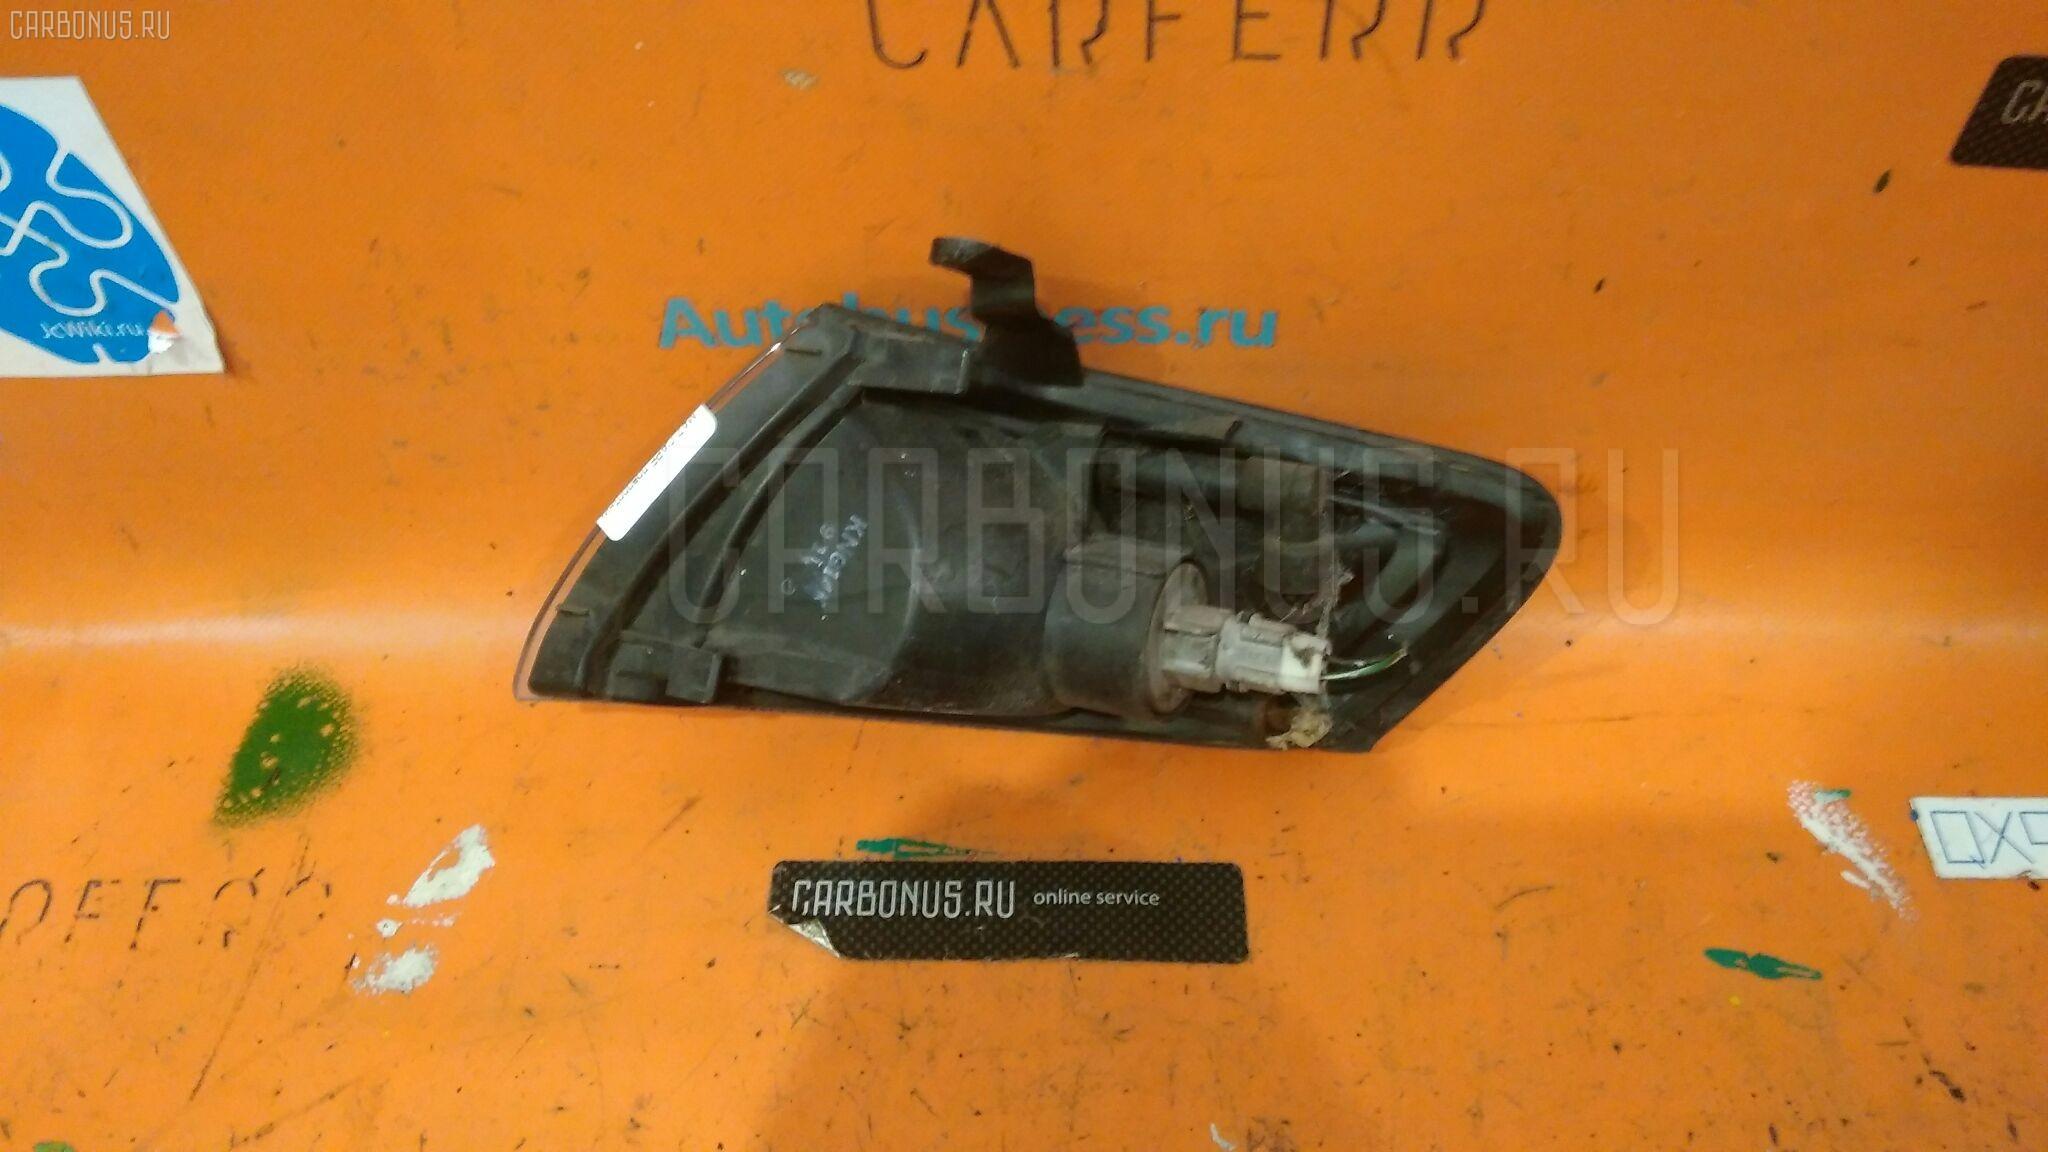 Поворотник к фаре Mazda Capella wagon GWEW Фото 1